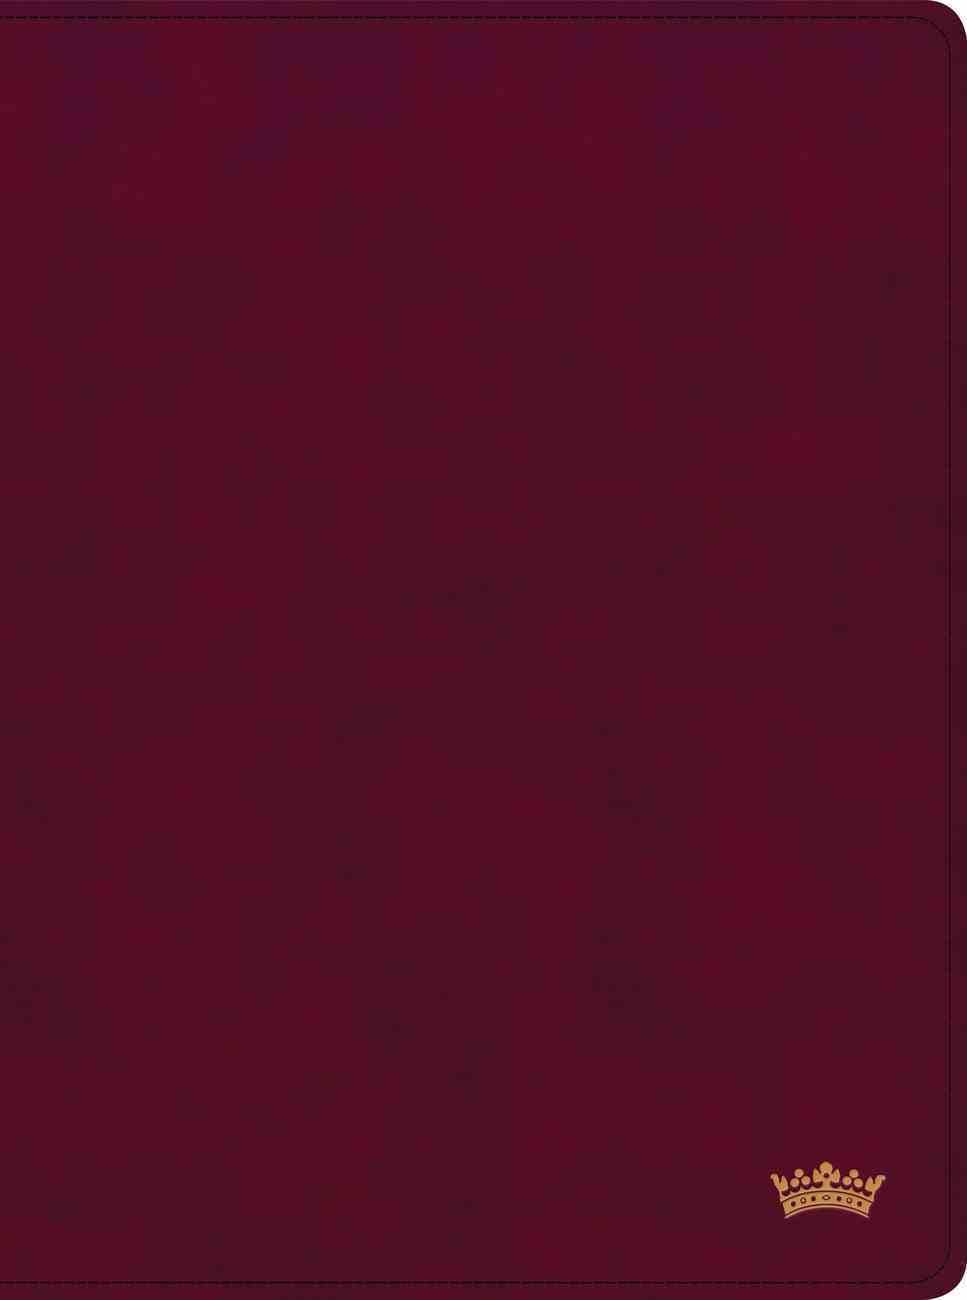 CSB Tony Evans Study Bible Burgundy (Black Letter Edition) Imitation Leather